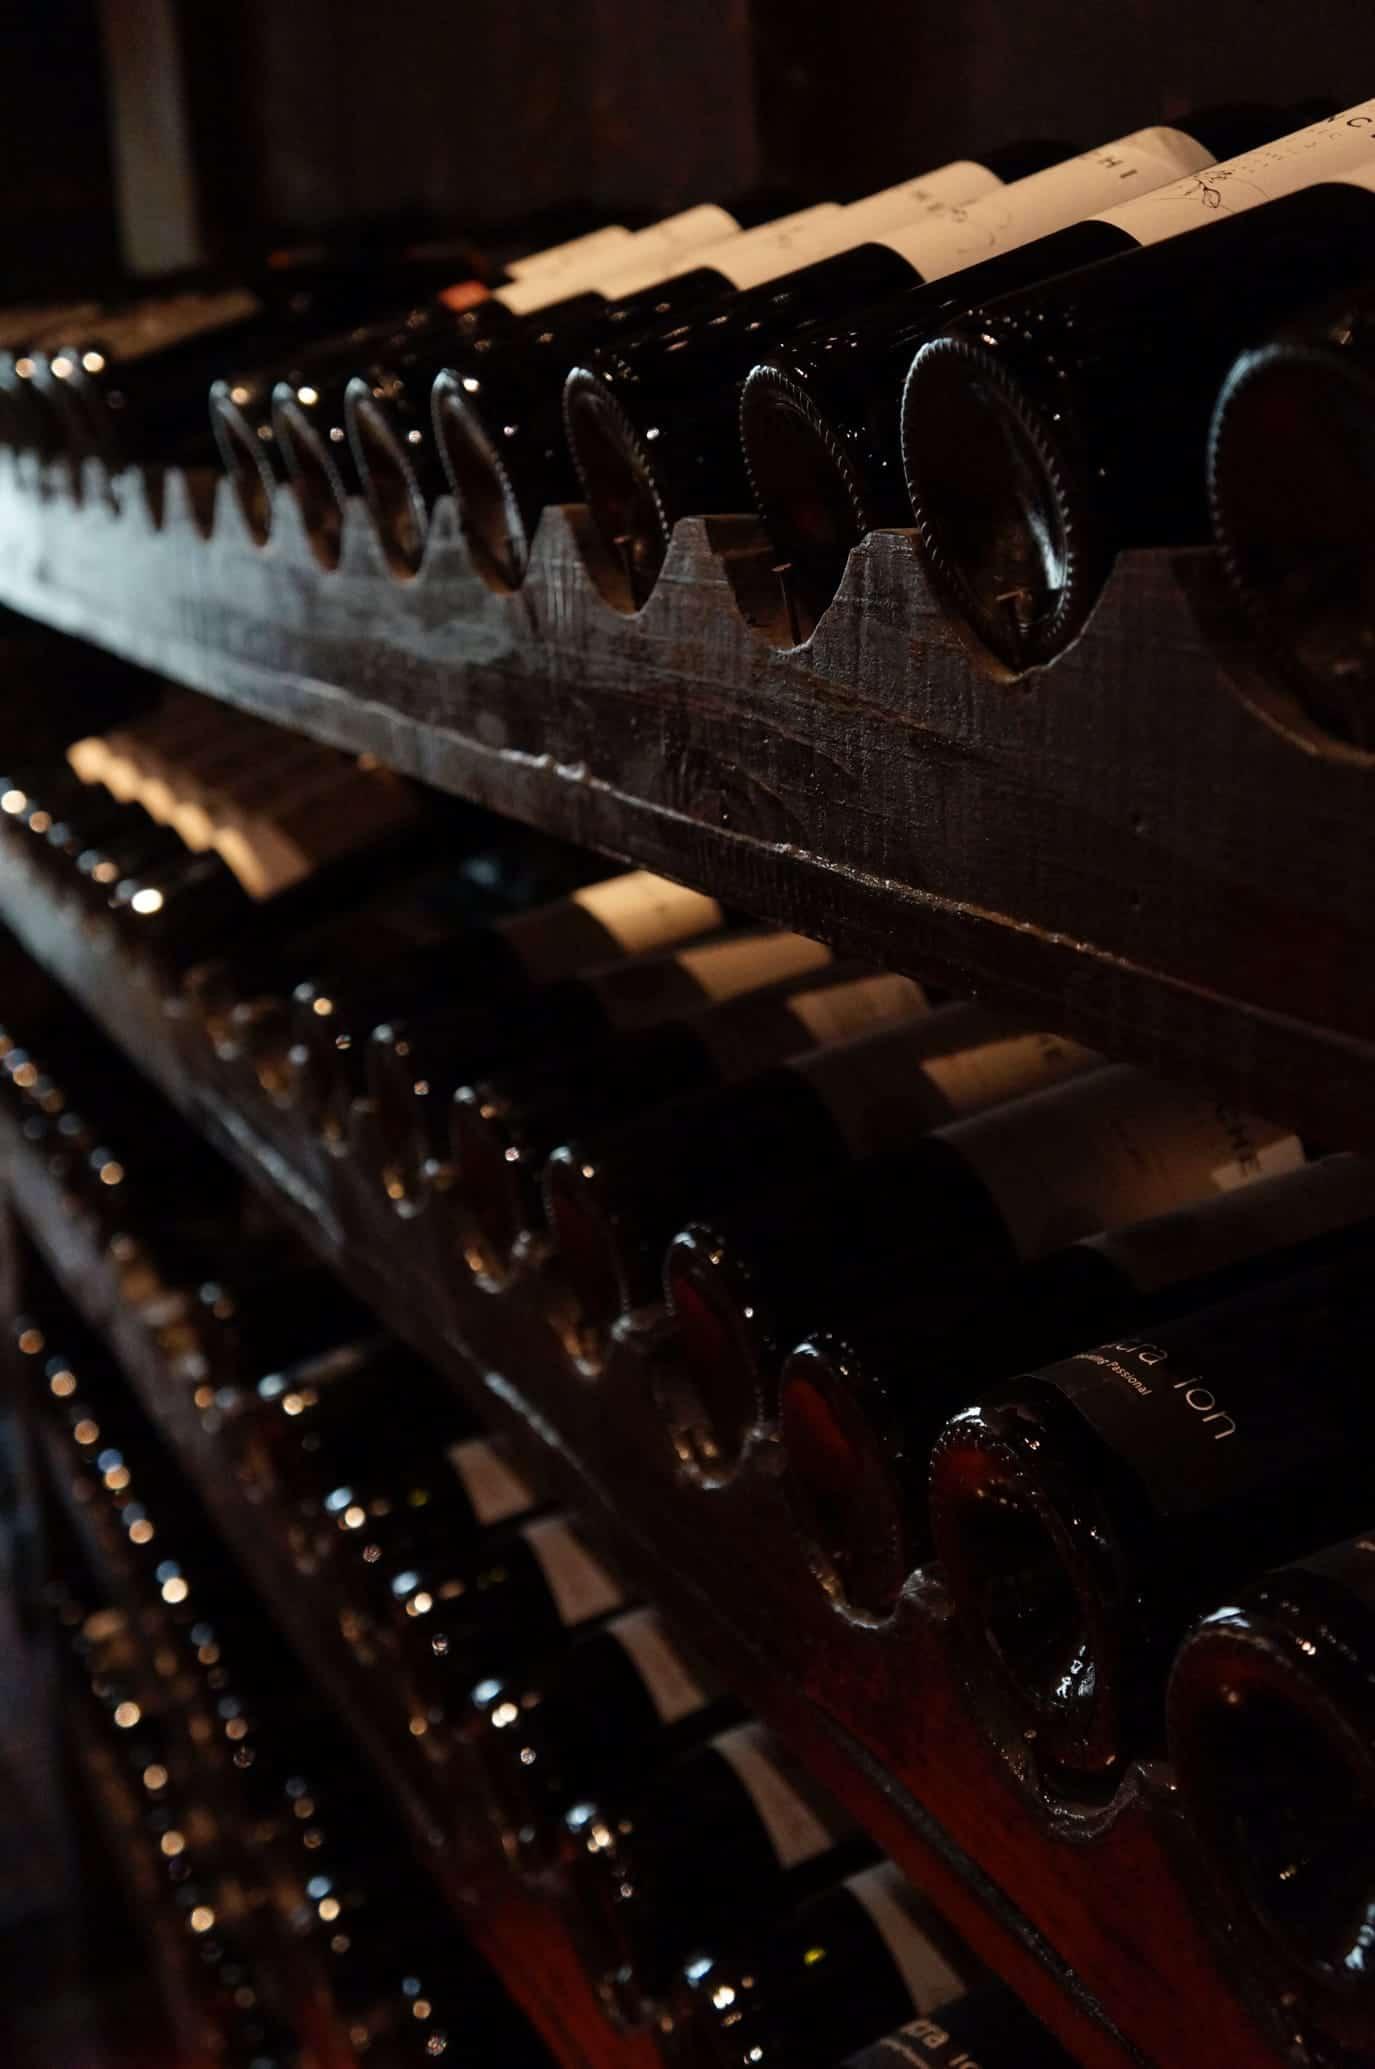 Series of bottle wines